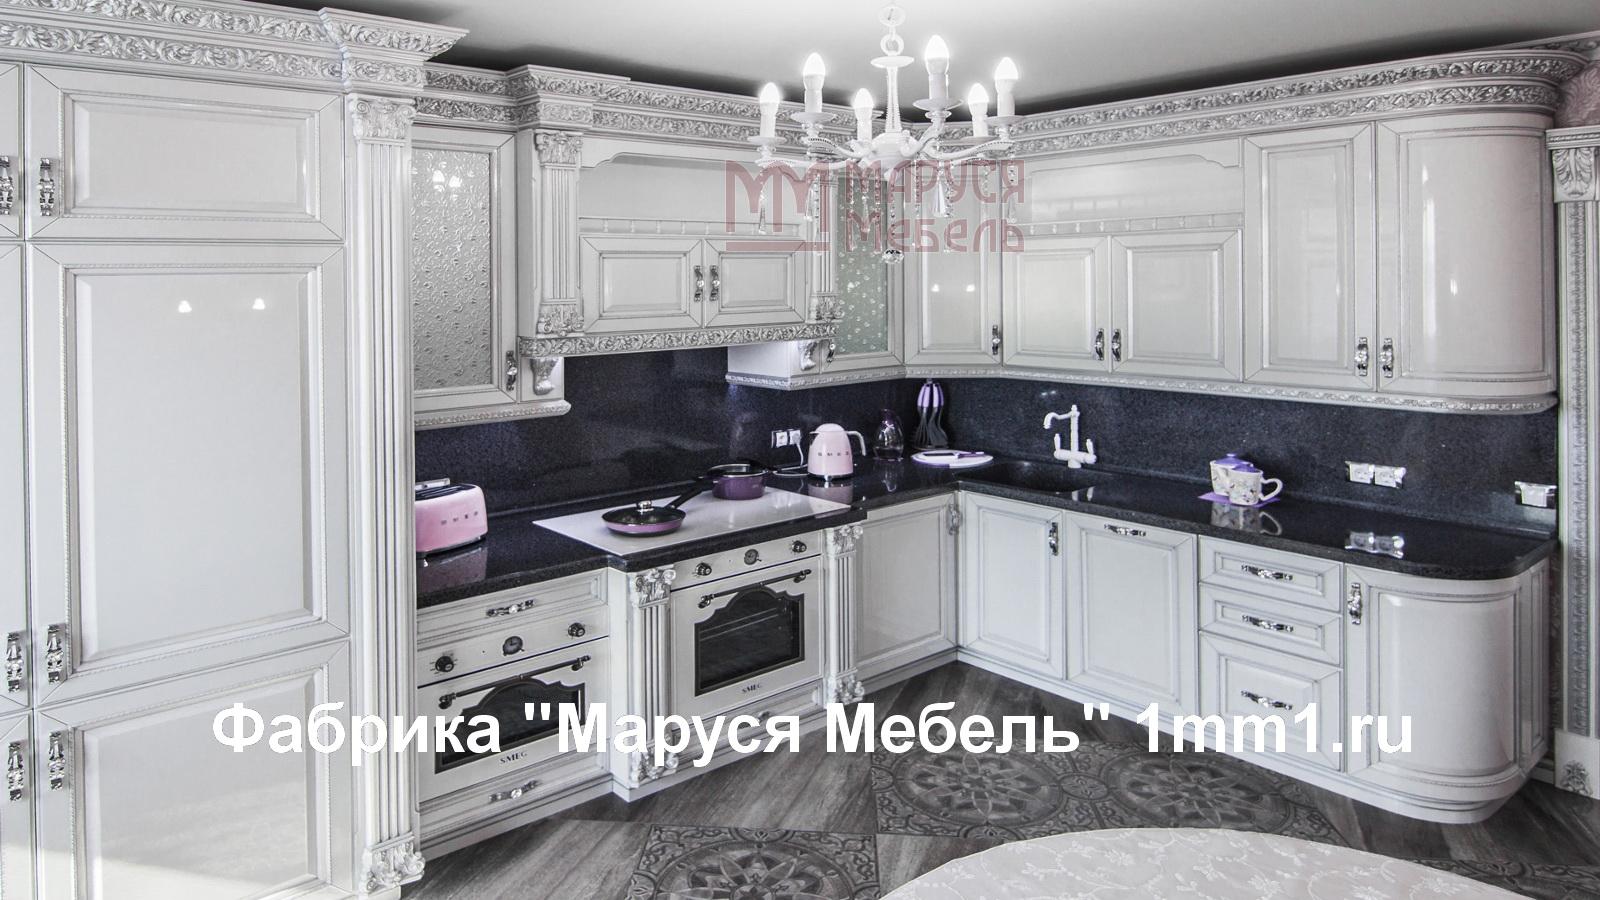 угловые кухни фабрика маруся мебель каталог угловых кухонь